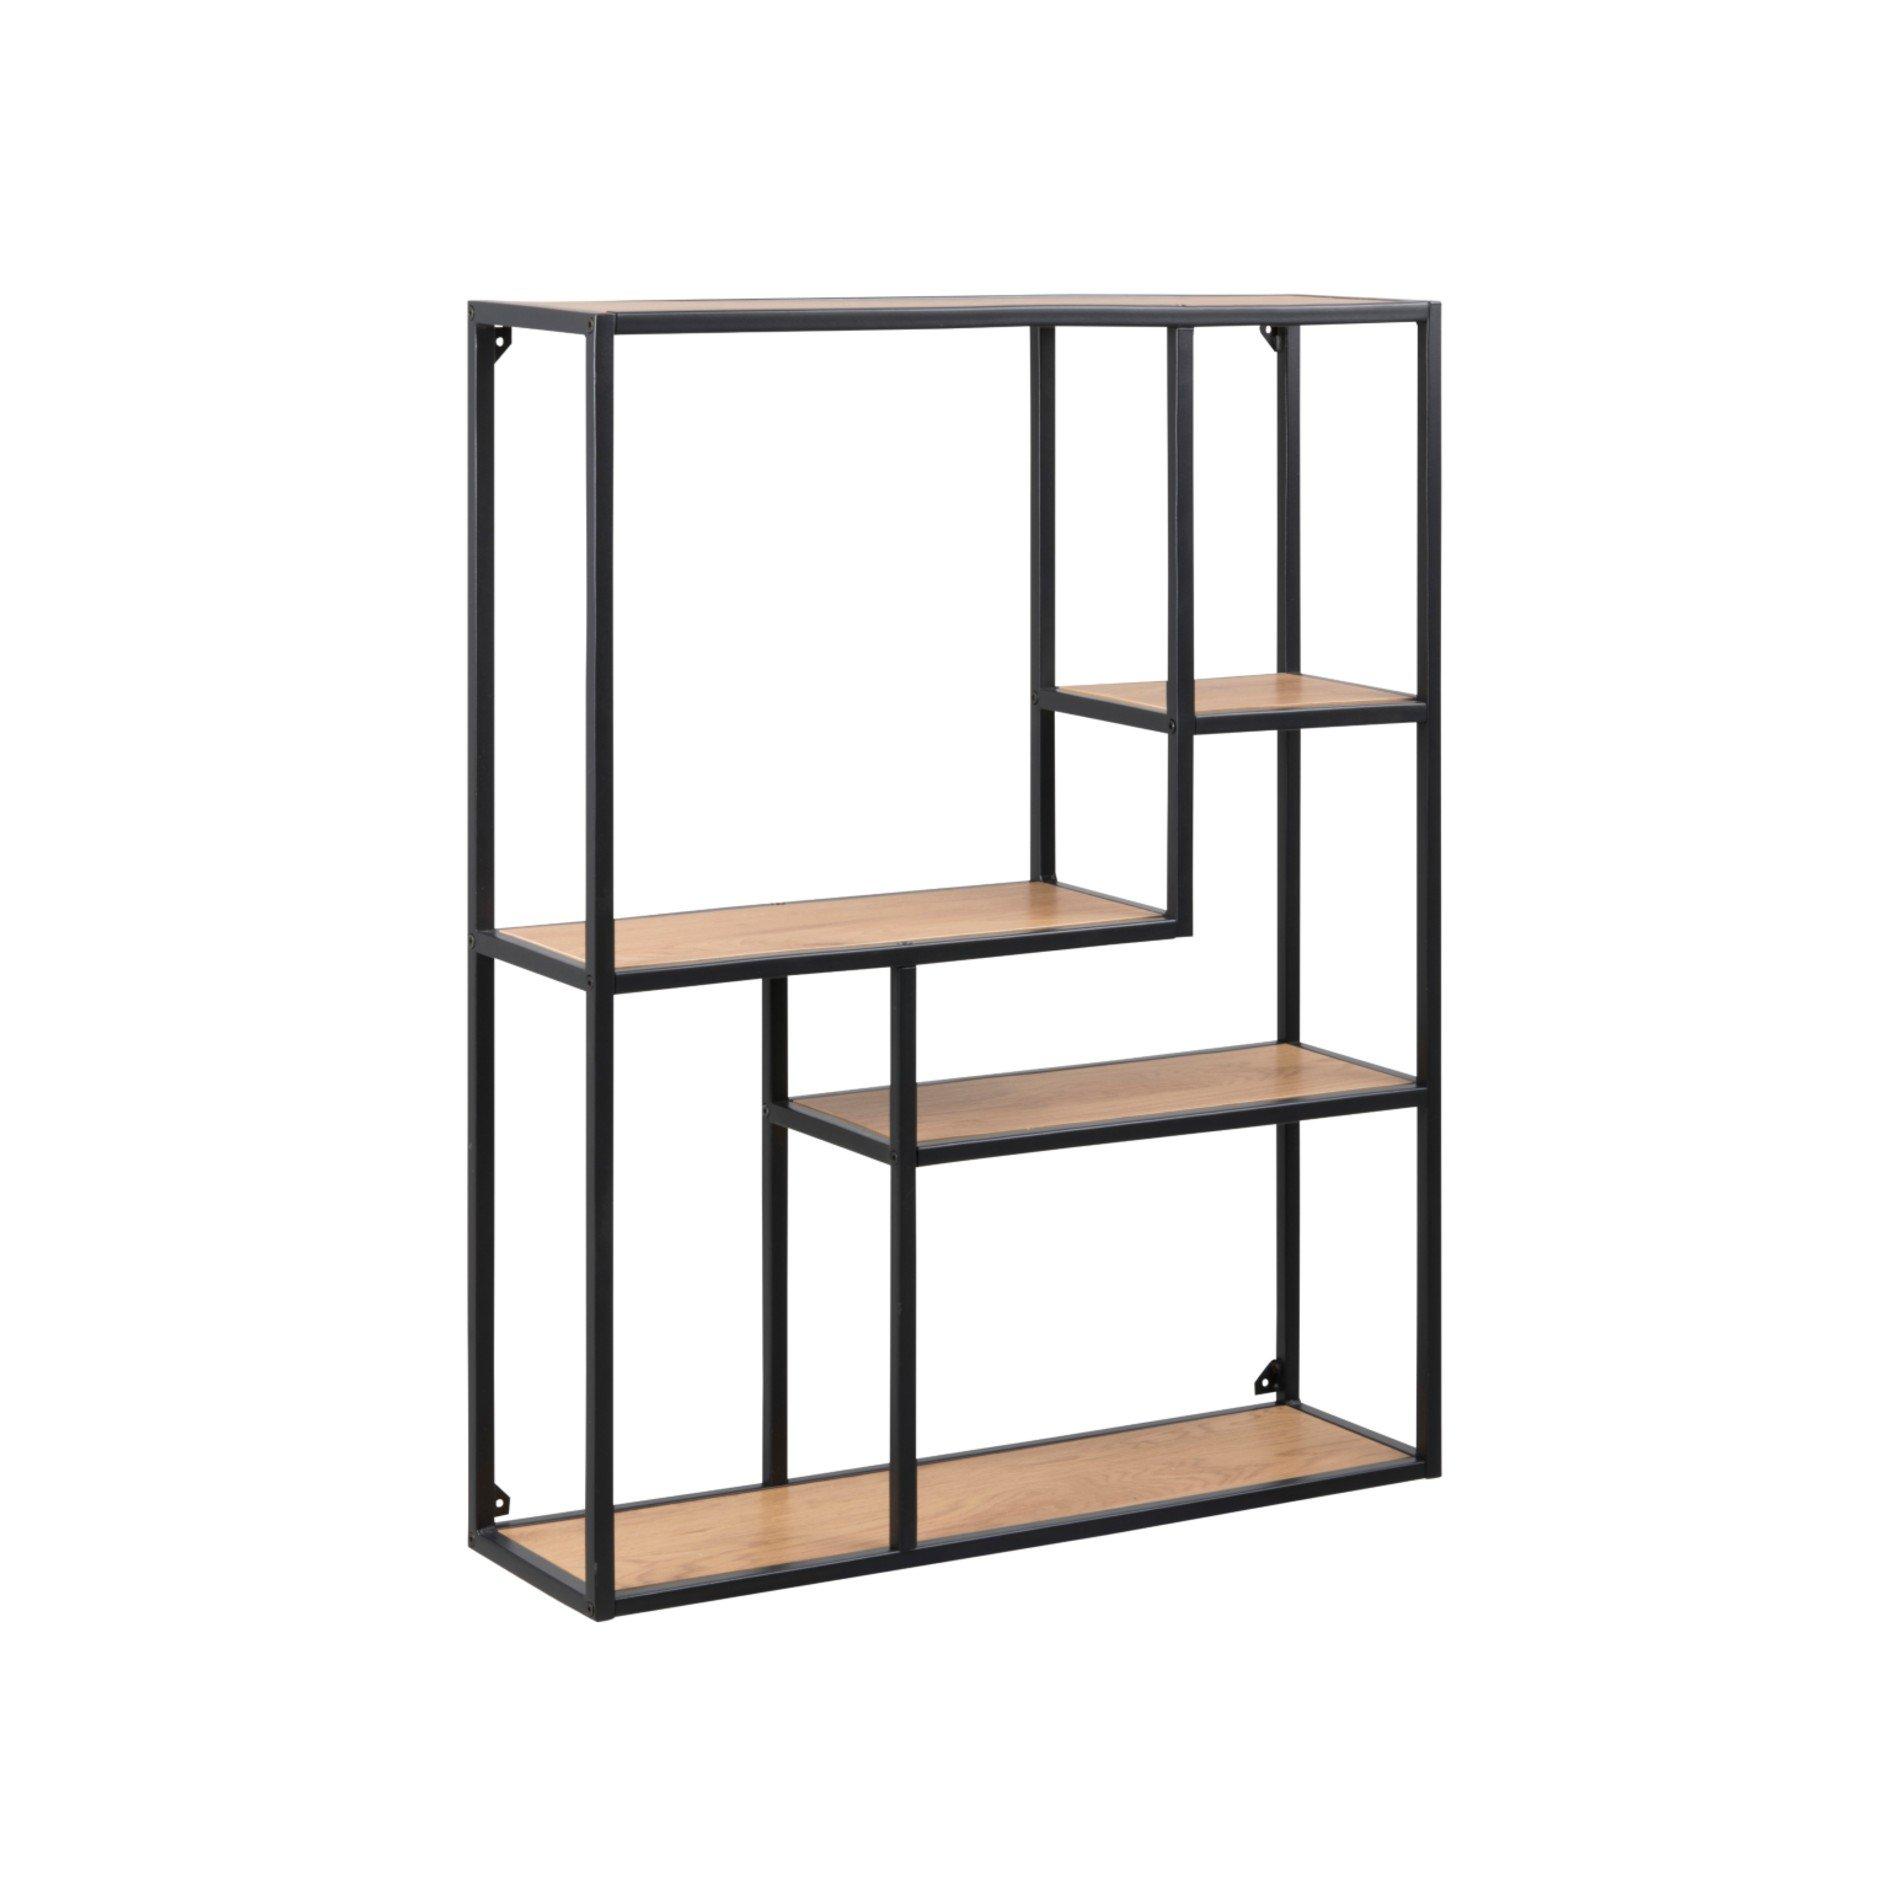 Full Size of Regalwürfel Metall Trendstore Auroa Regal Asymmetrisch Regale Weiß Bett Wohnzimmer Regalwürfel Metall